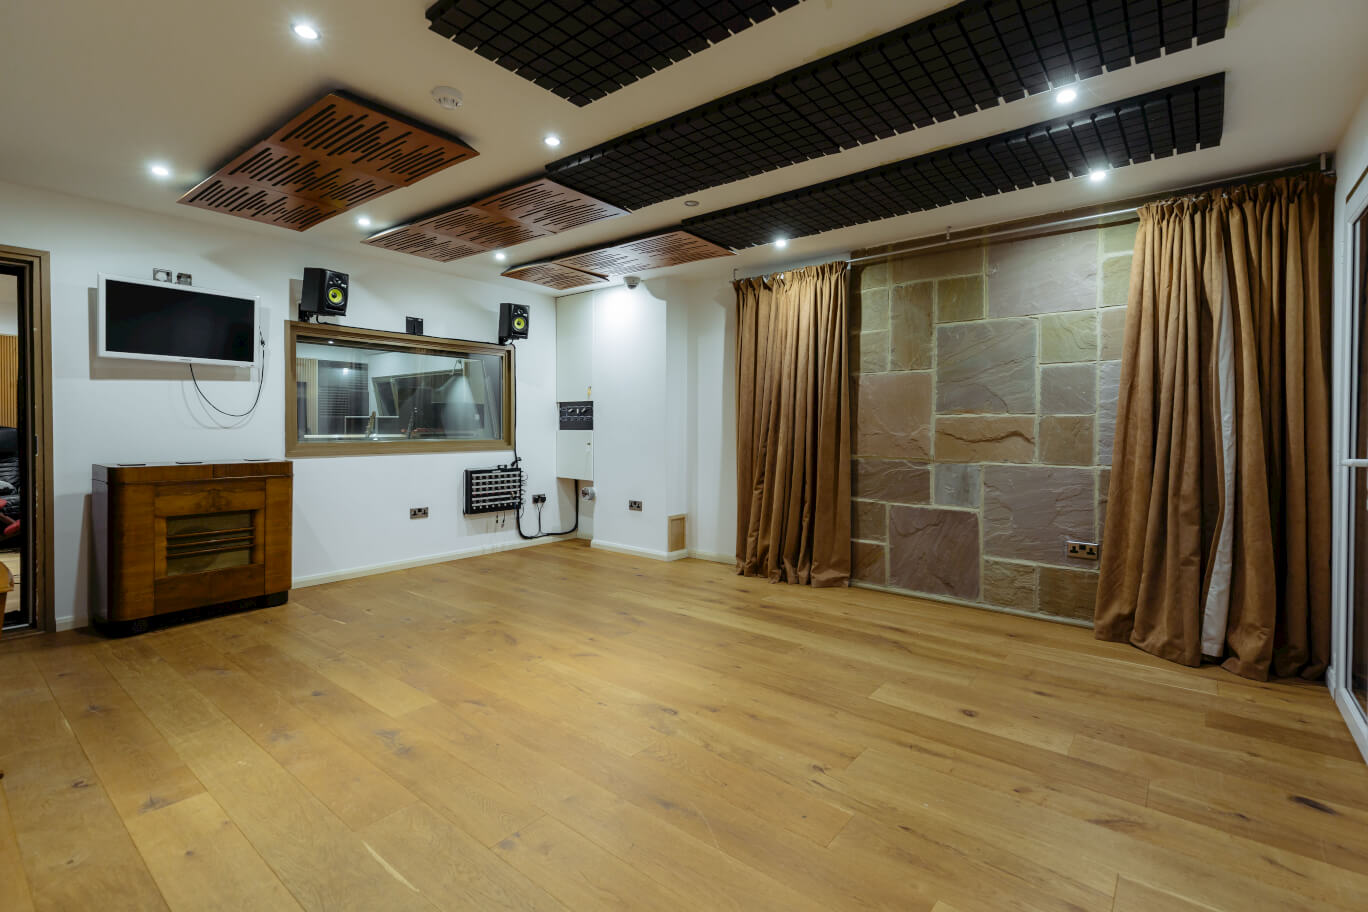 recording-studio-oxford-evolution-inside-room.jpg